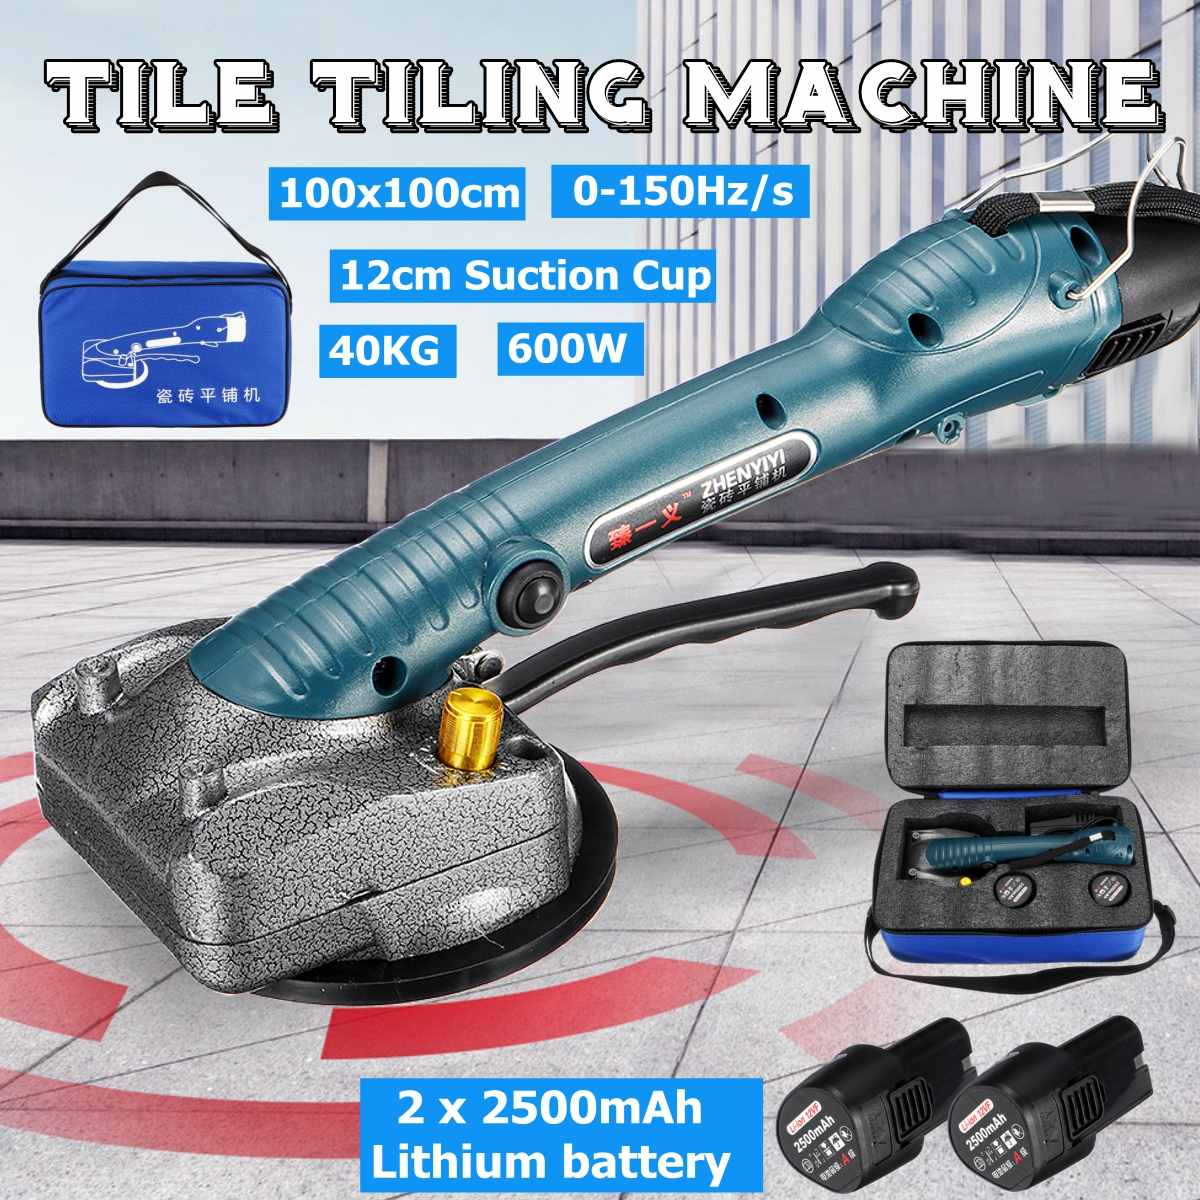 600W Tile Machine Vibrators High Power  Machine Electric Floor Tile Vibrator Tiling Tile Tool + 2x2500mAhBatteries